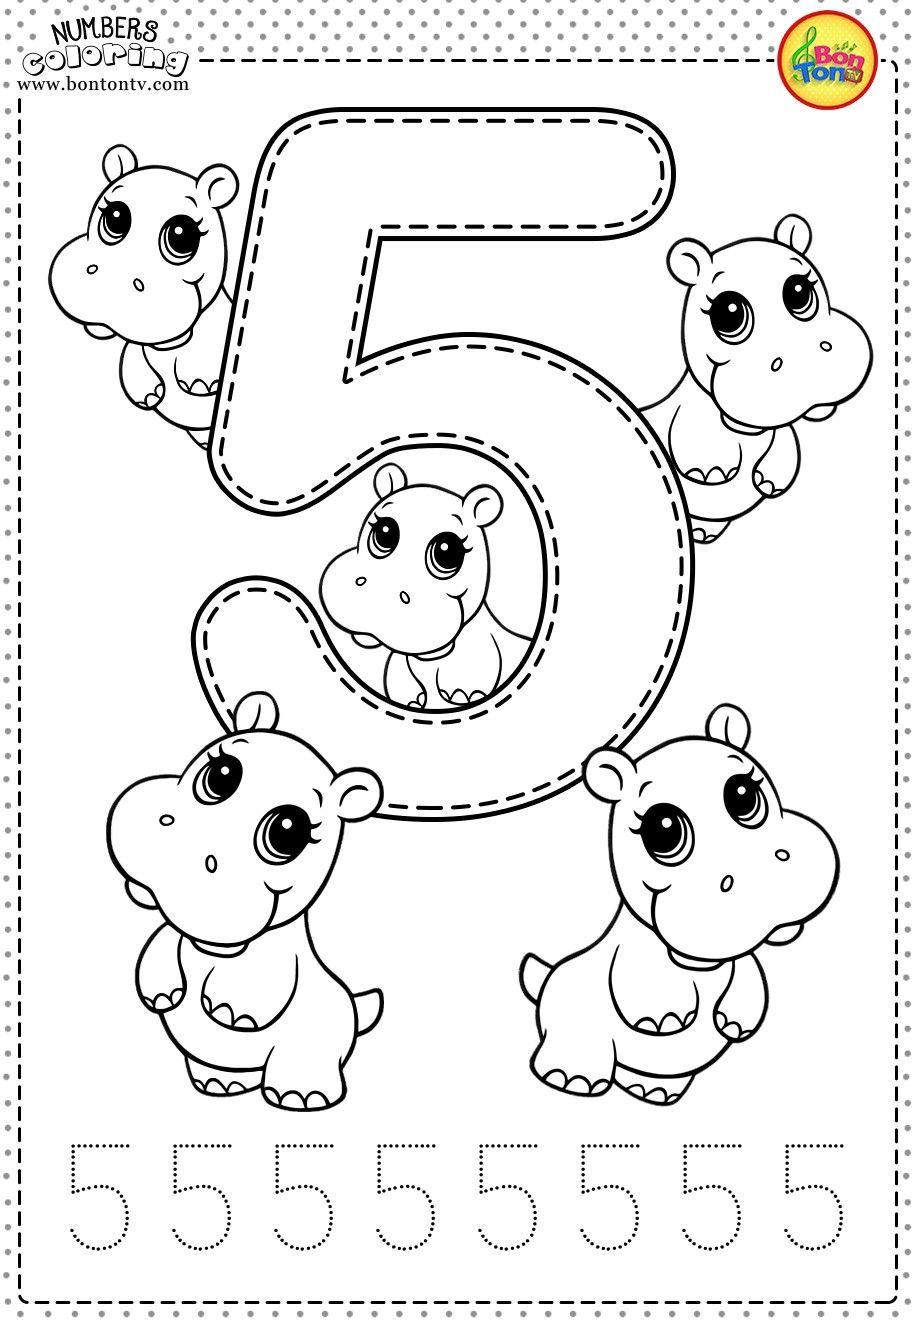 4 Tracing Pages For Preschool Numbers Number 5 Preschool Printables Free W Free Preschool Printables Kids Learning Numbers Preschool Worksheets Free Printables